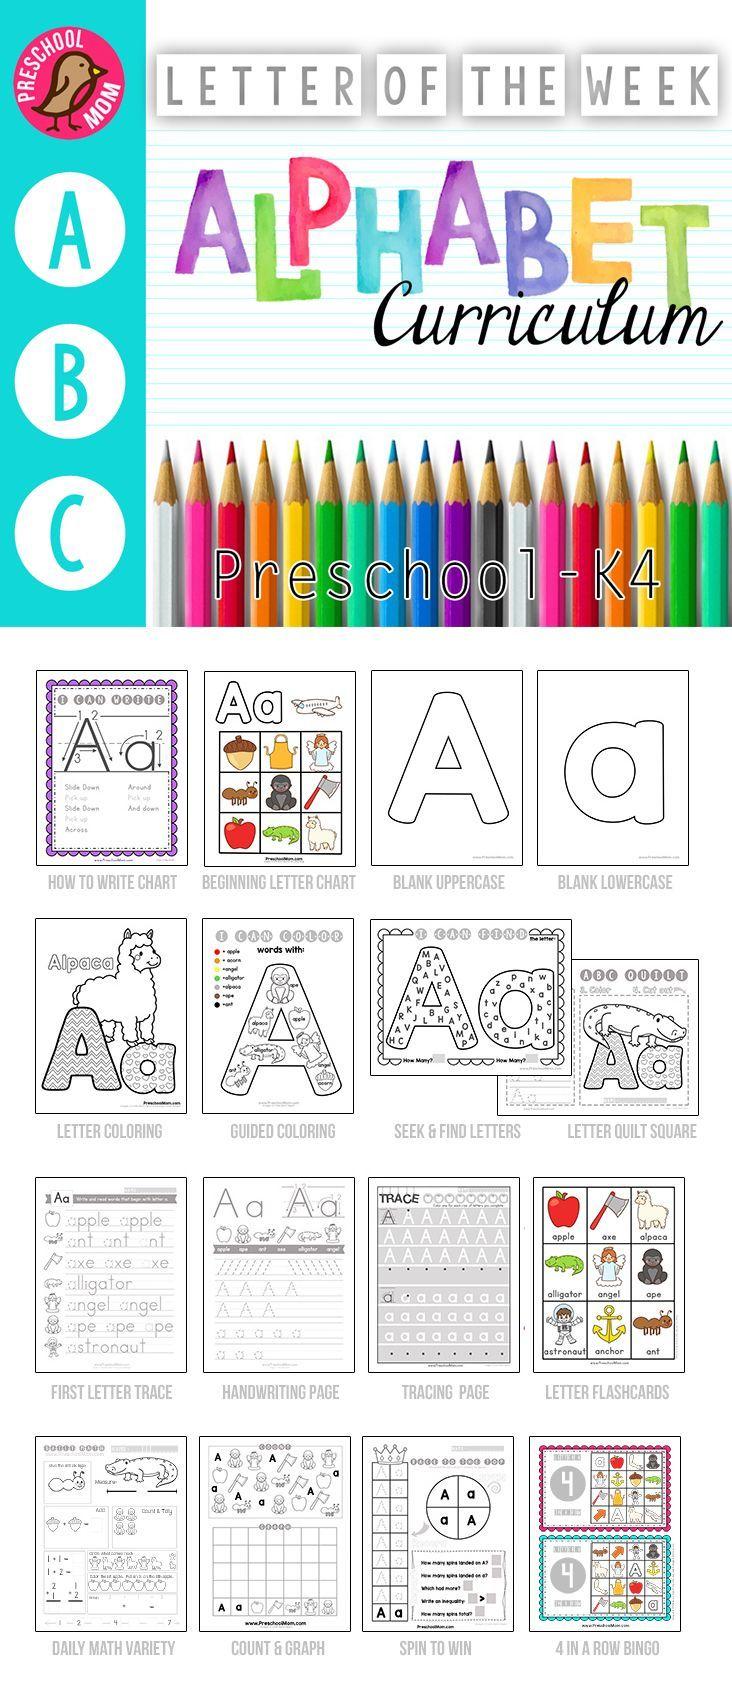 Letter of the Week Preschool or K4 Curriculum